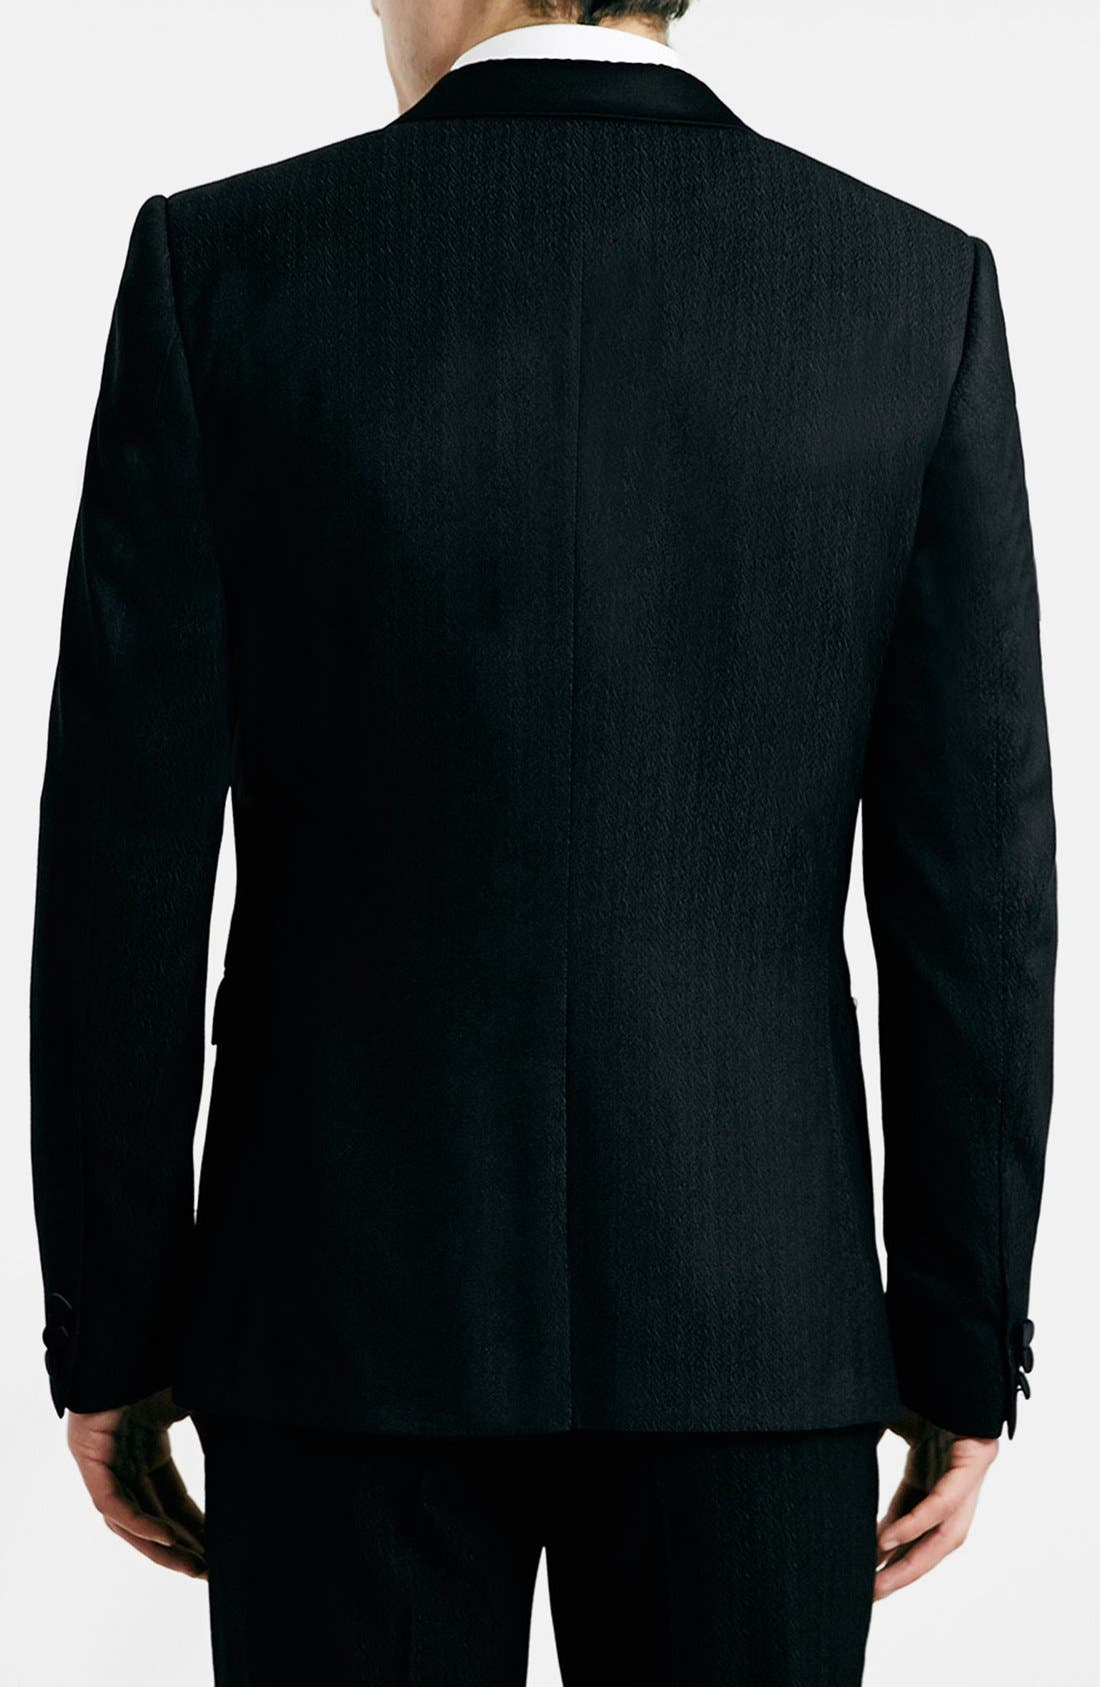 TOPMAN, Black Textured Skinny Fit Tuxedo Jacket, Alternate thumbnail 5, color, 001